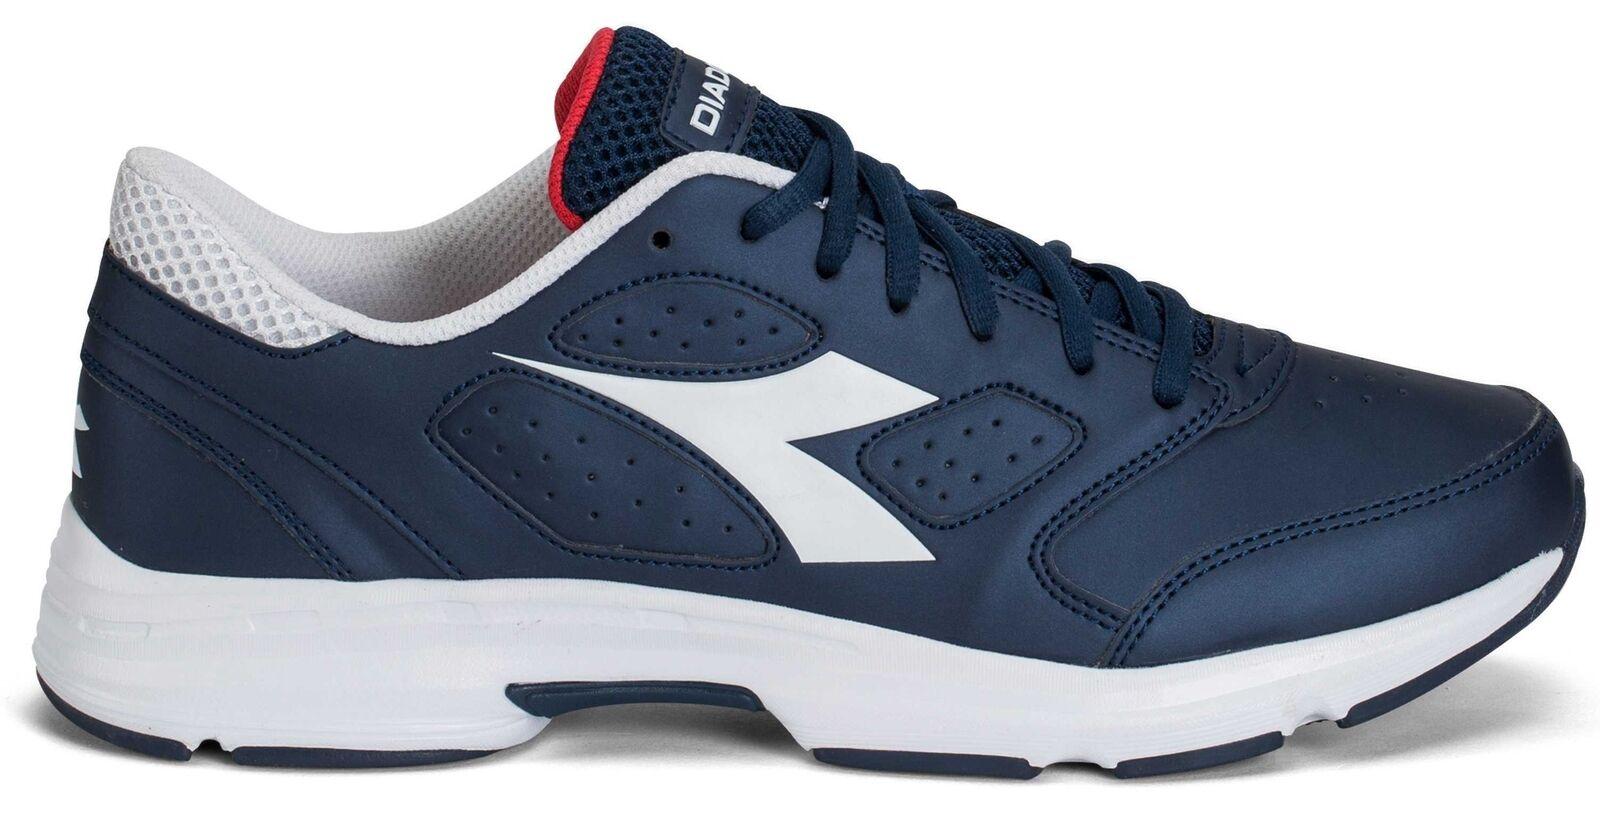 Diadora Scarpa Running Sneaker Jogging men Shape 7 sl Saltire navy white shoes